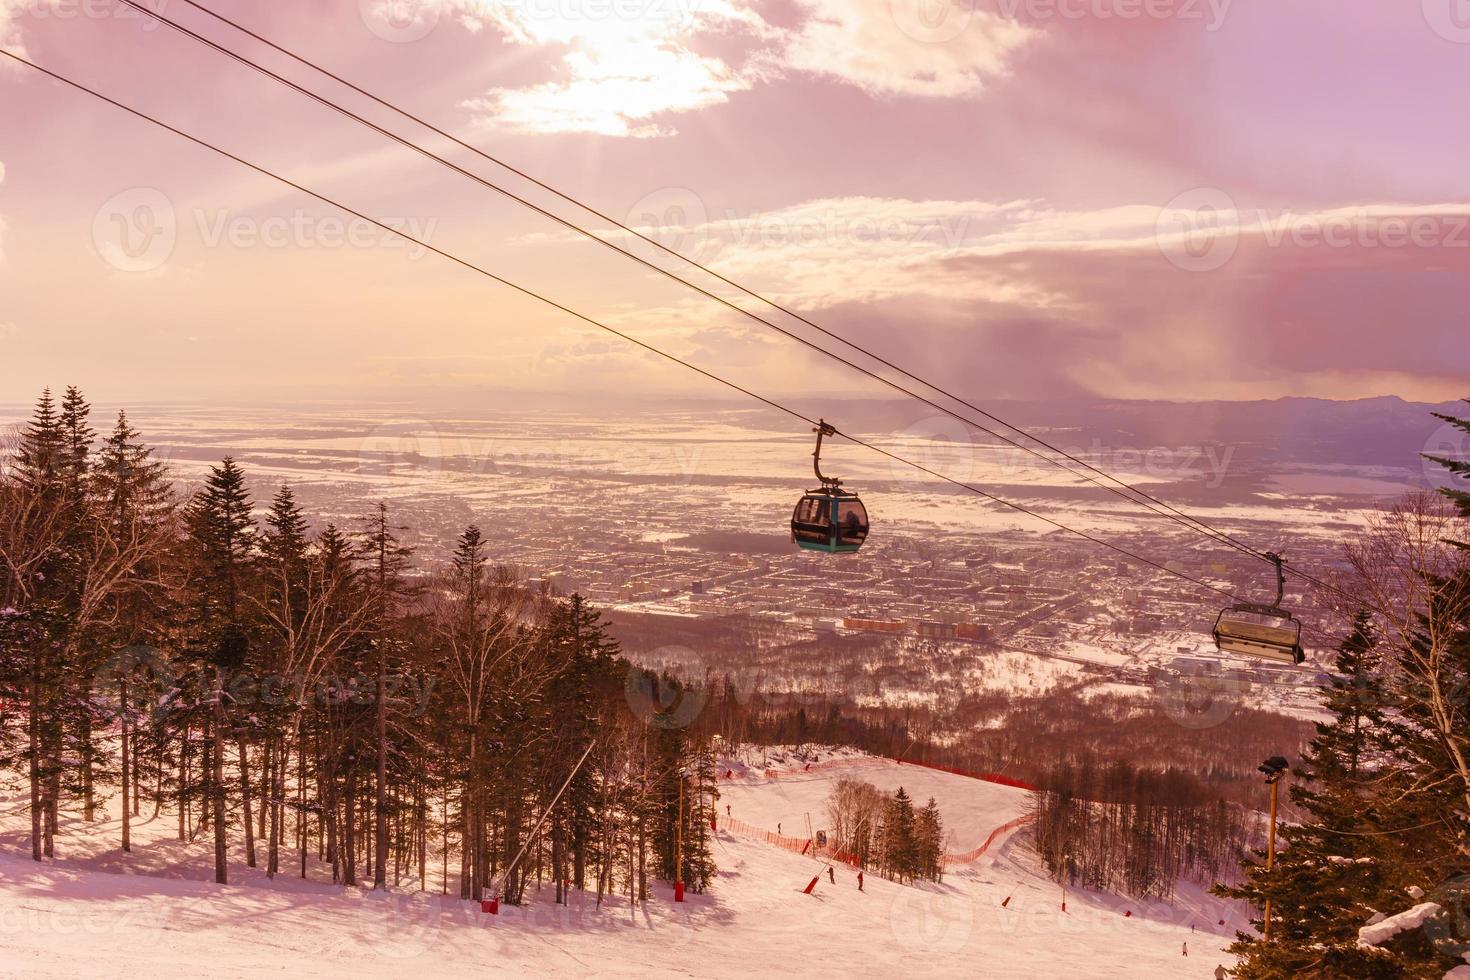 Cabin moving on ski lift photo